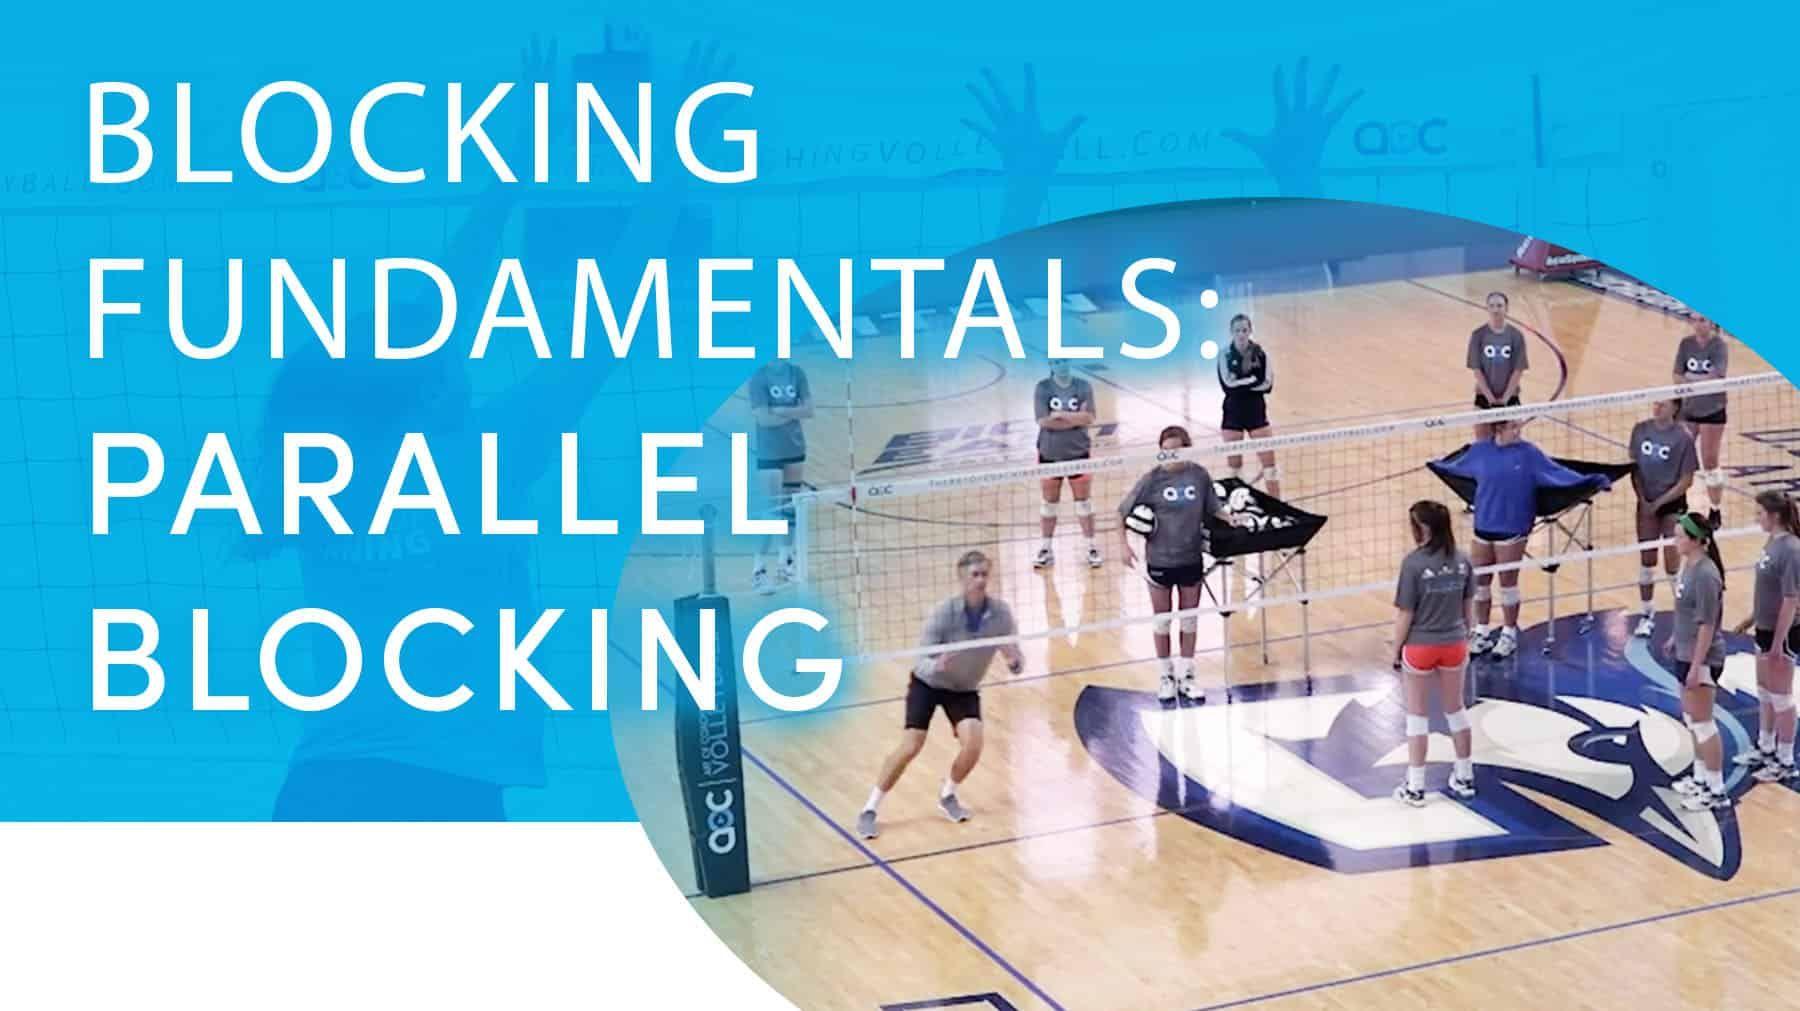 Blocking Fundamentals Parallel Blocking Coaching Volleyball Coaching Volleyball